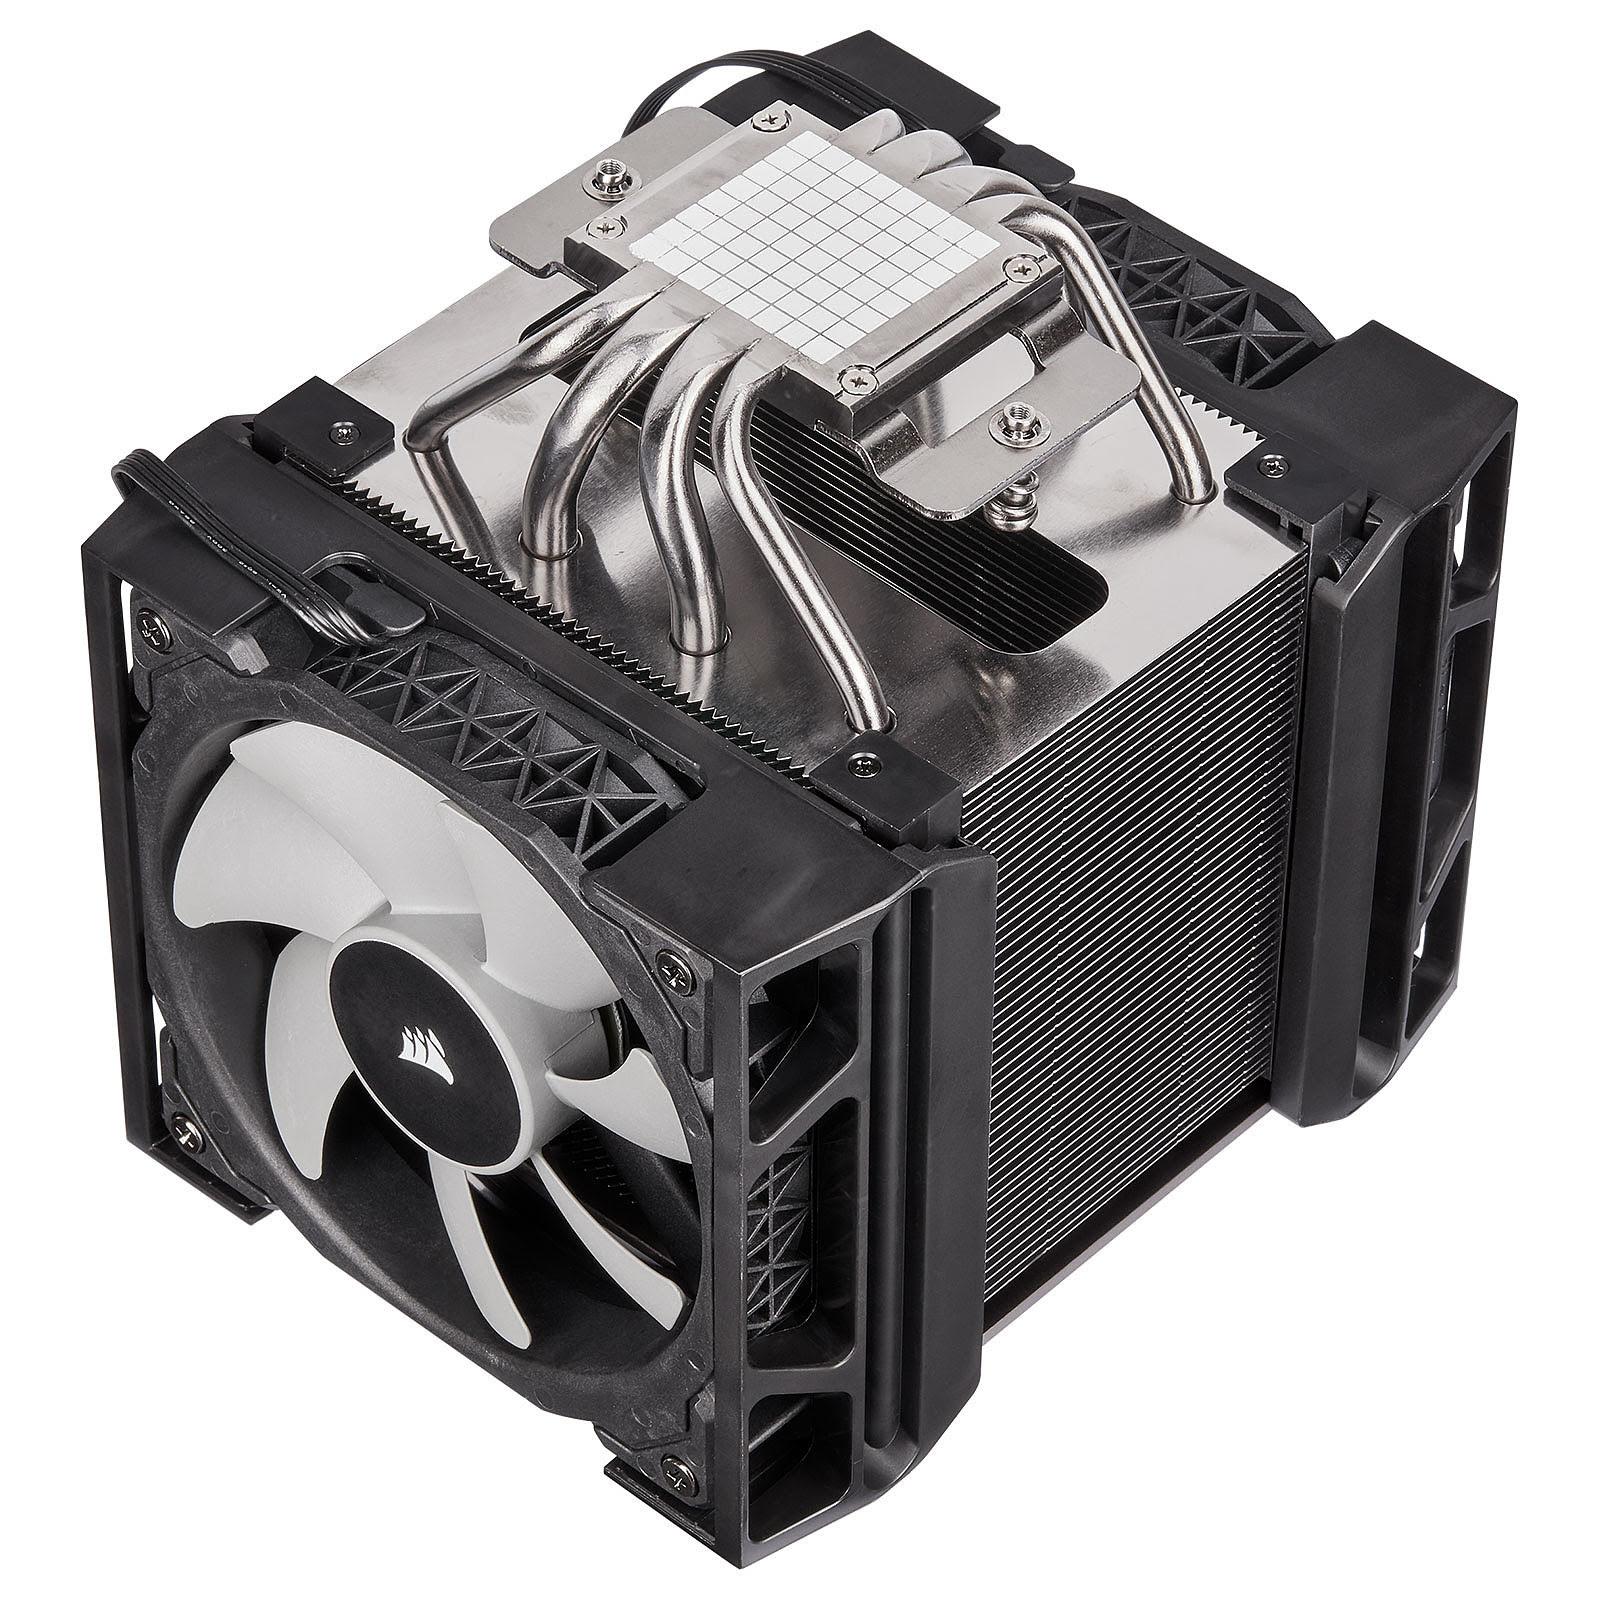 Corsair A500 Air Cooler - Ventilateur CPU Corsair - Cybertek.fr - 3